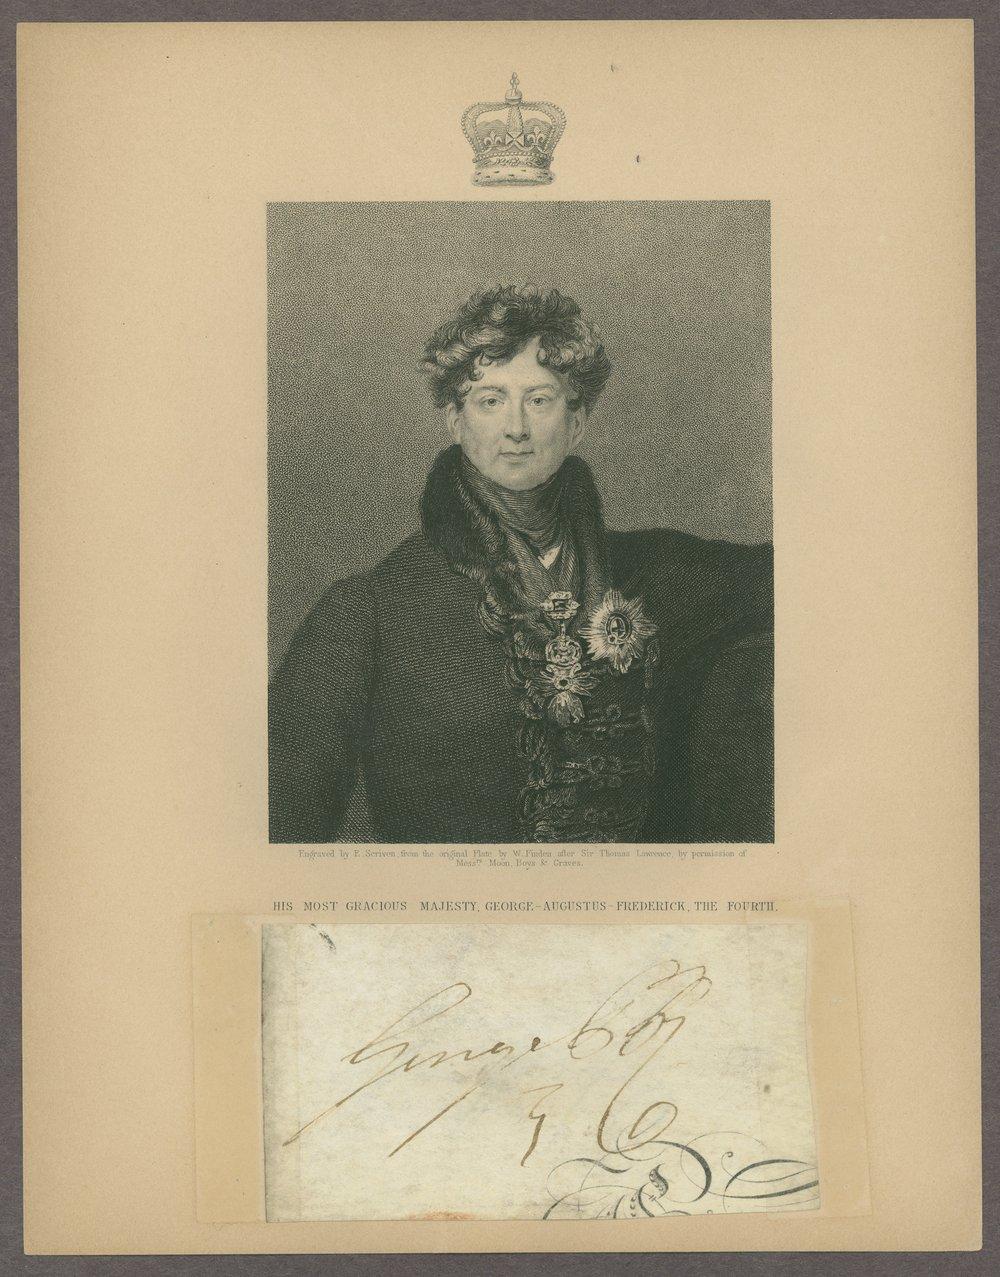 King George III materials - 1 [Box 1, Folder 28]